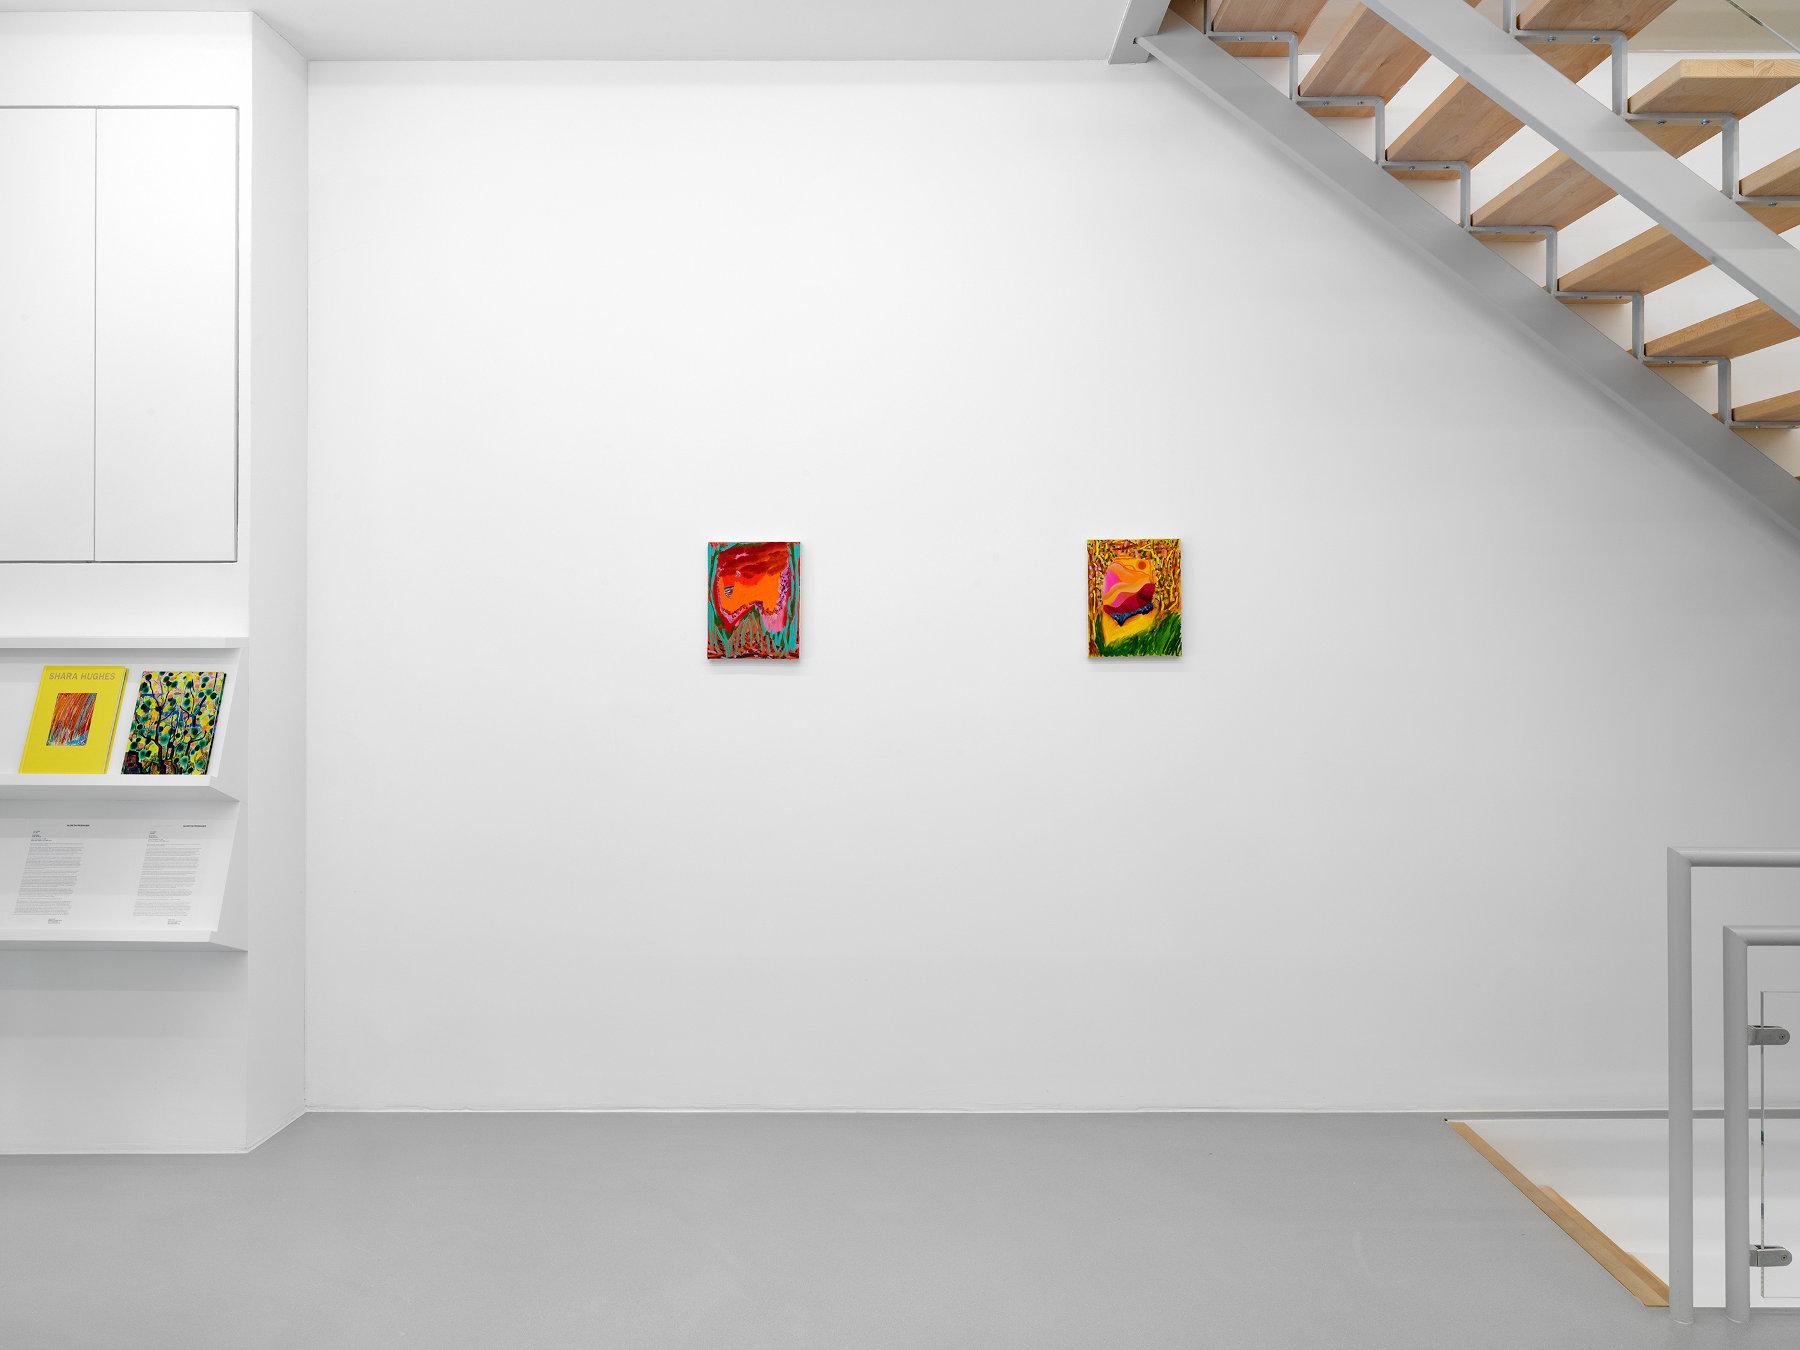 Galerie Eva Presenhuber Ramistrasse Shara Hughes 1